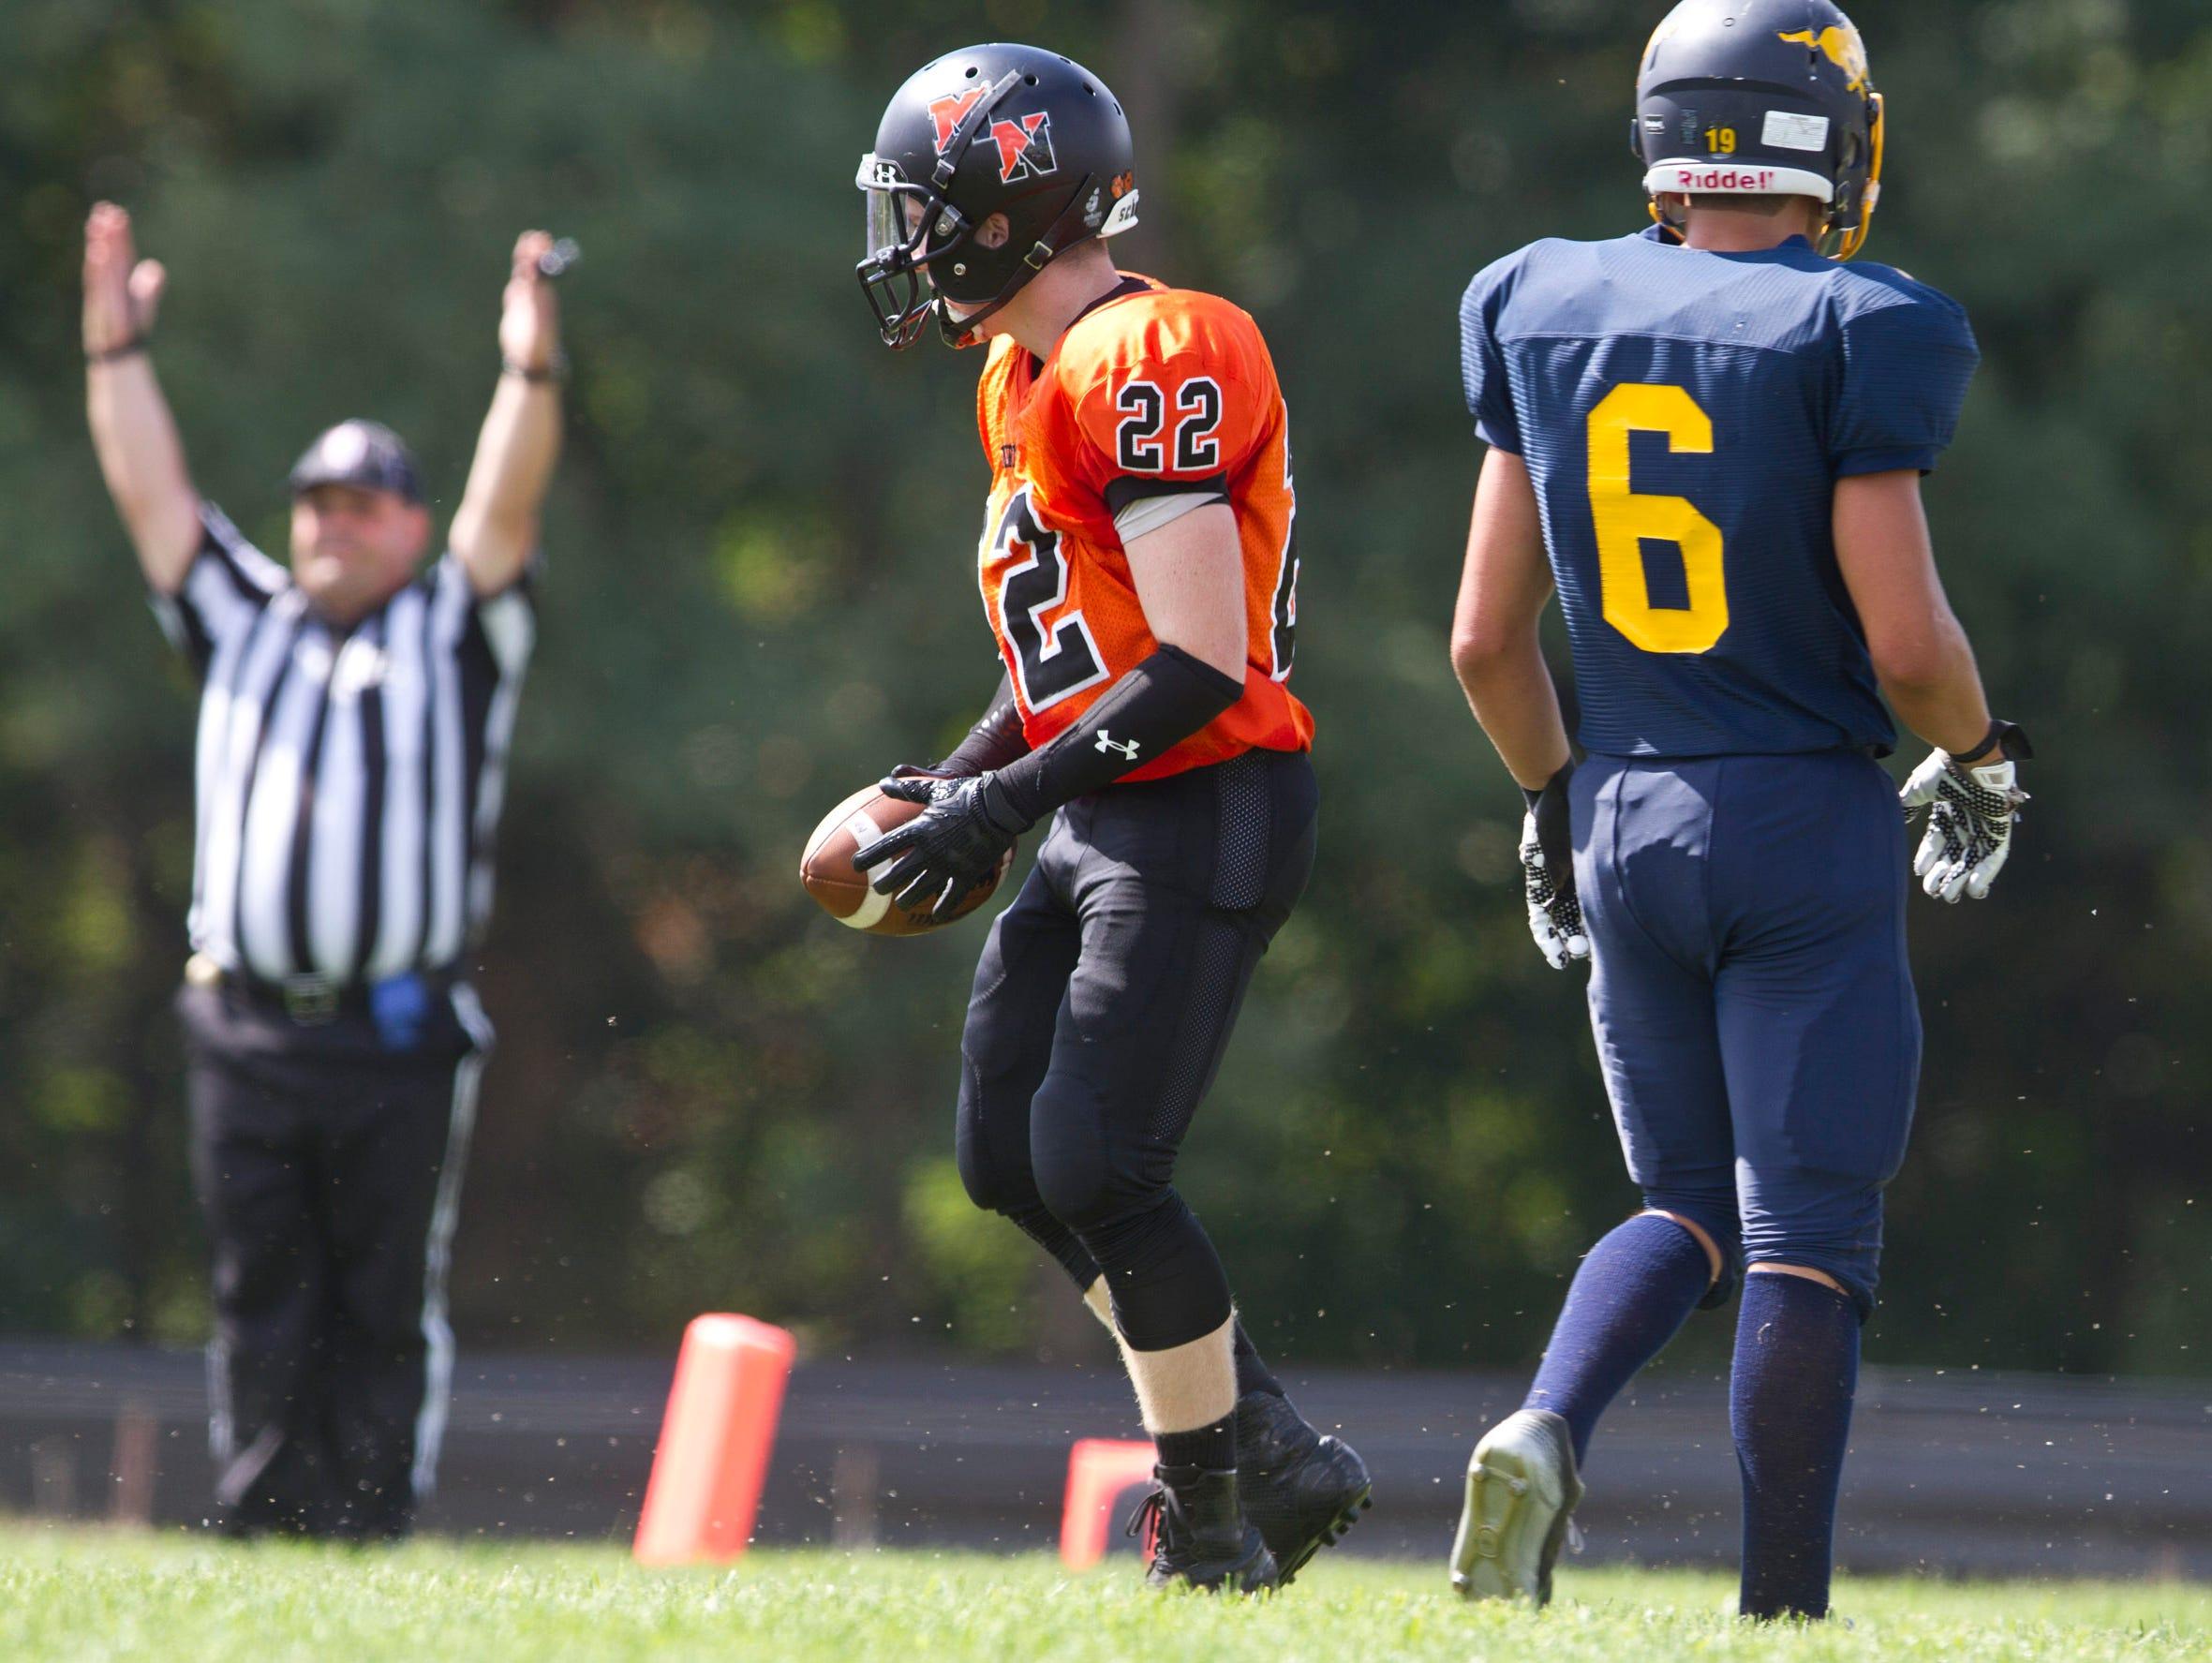 Middletown North vs Marlboro football. Marlboro, NJ Saturday, September 19, 2015 @dhoodhood